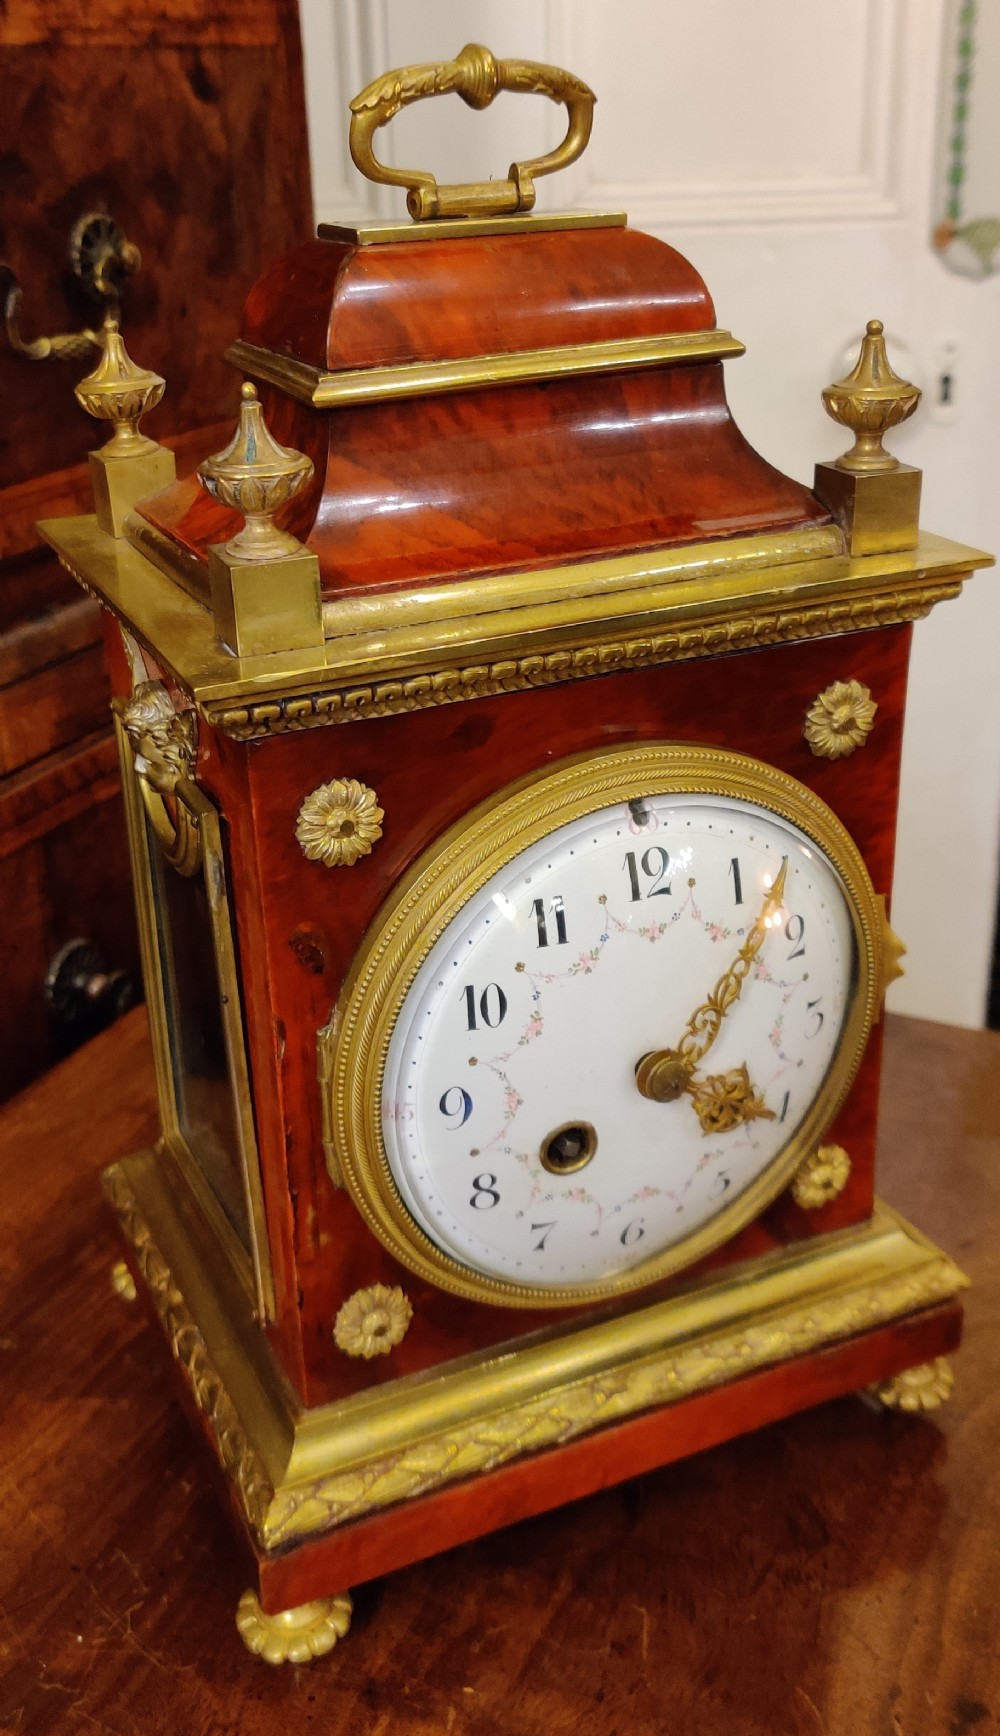 19th century french tortoiseshell and gilt bronze mounted mantel clock